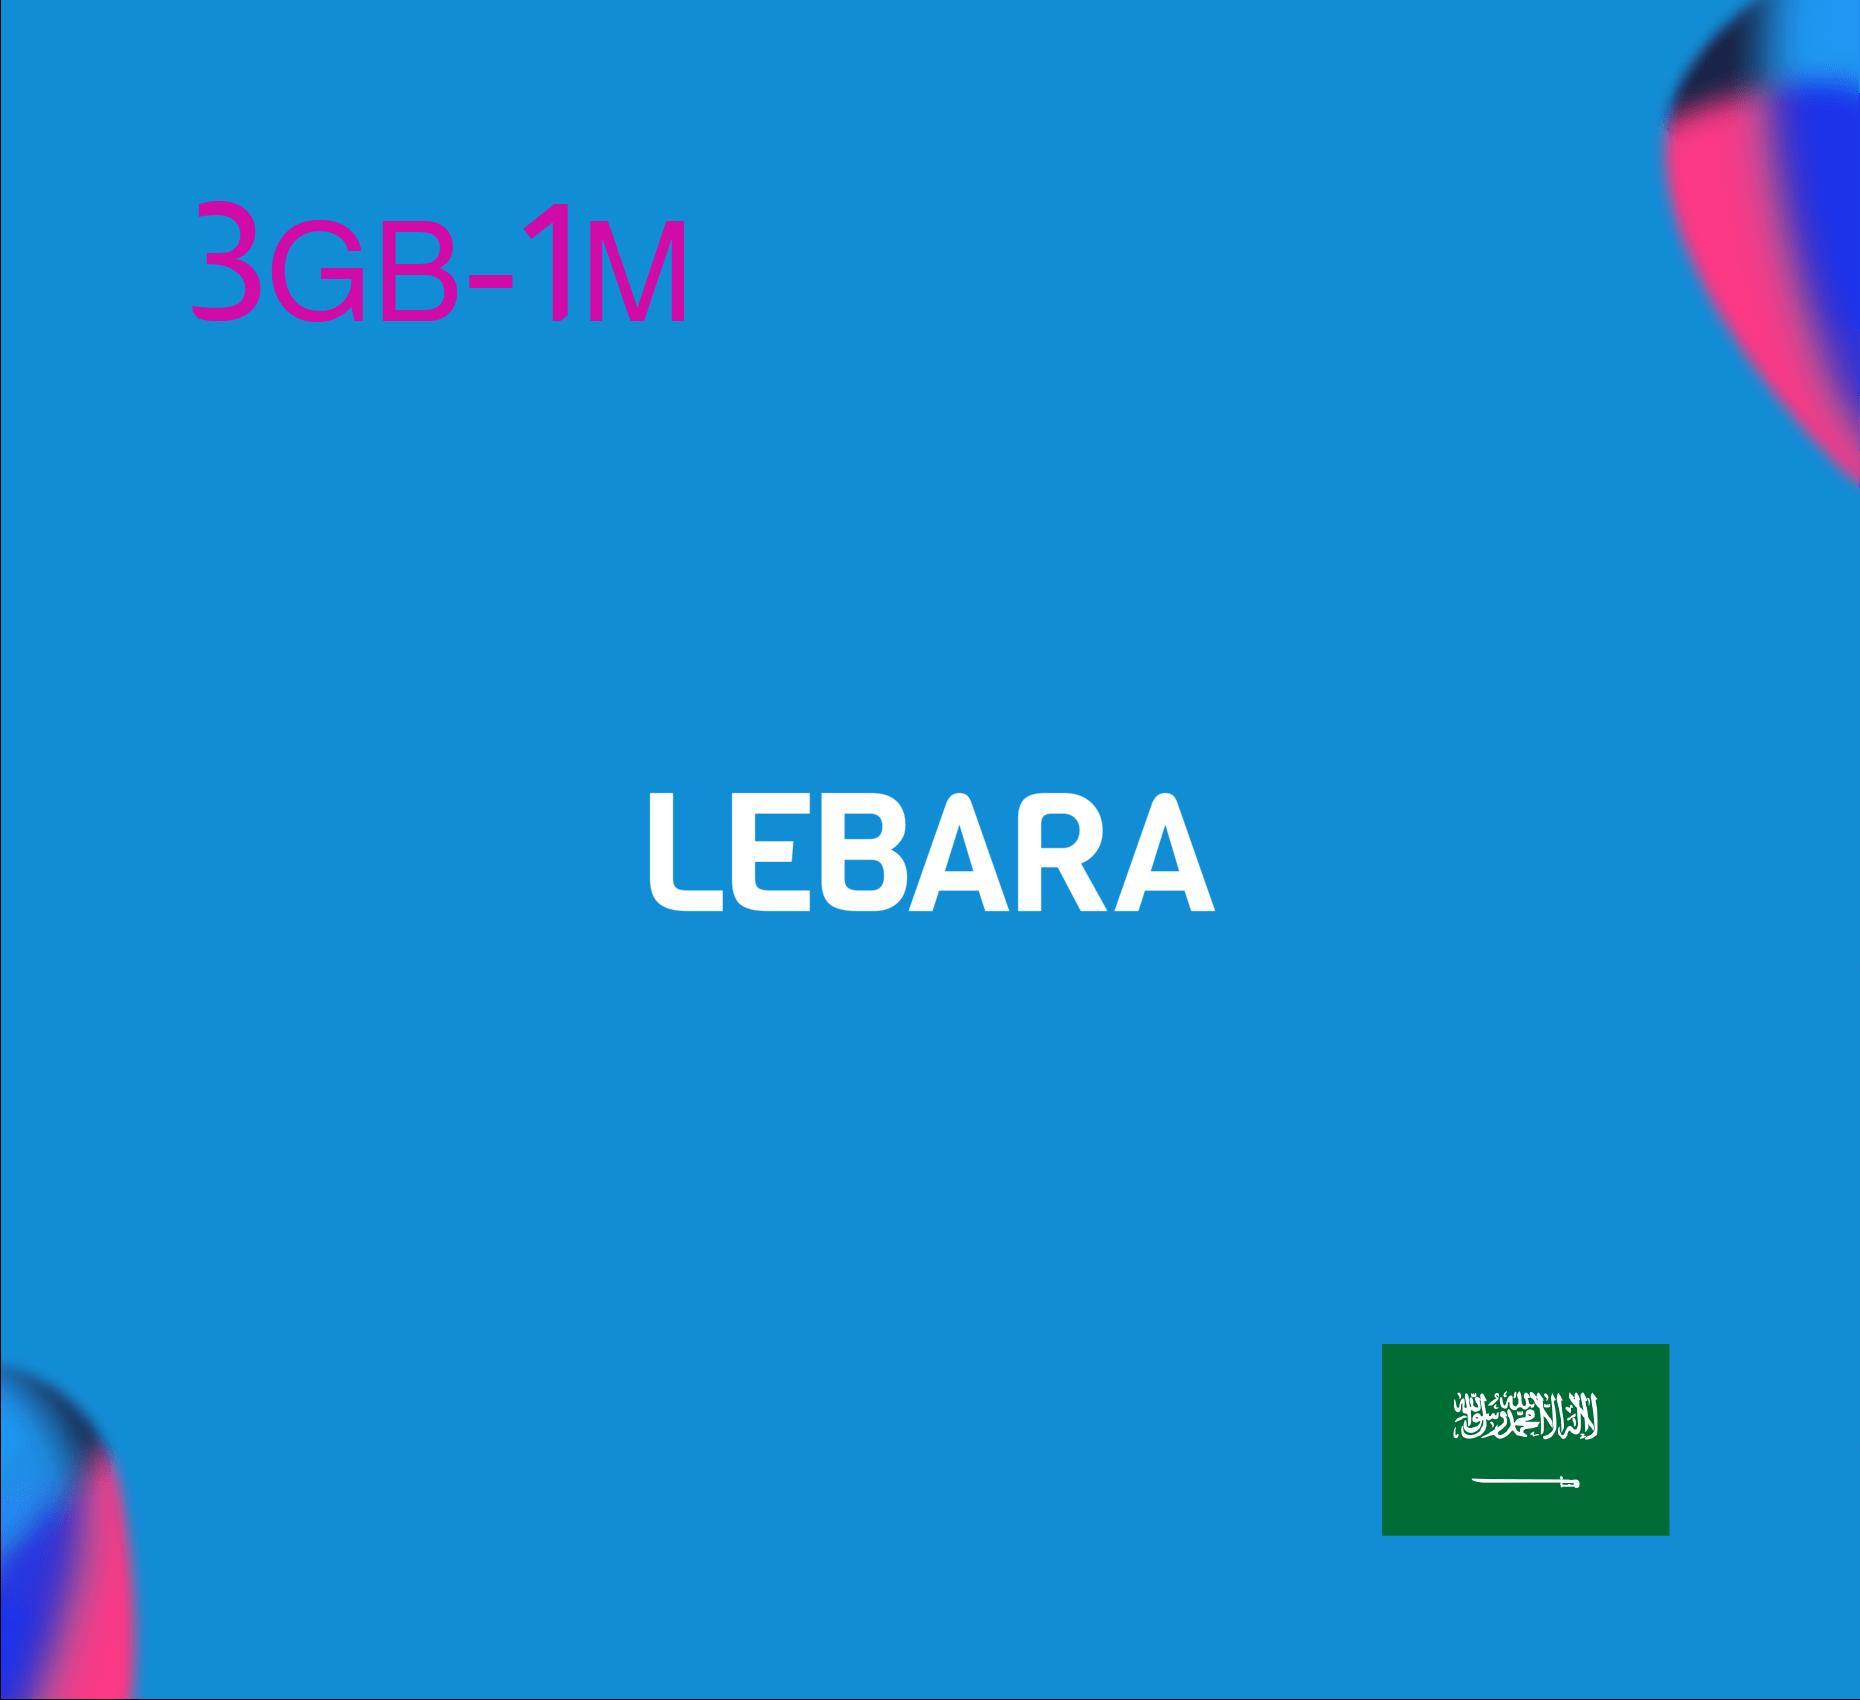 Lebara Data Recharge 3GB - 1 Month